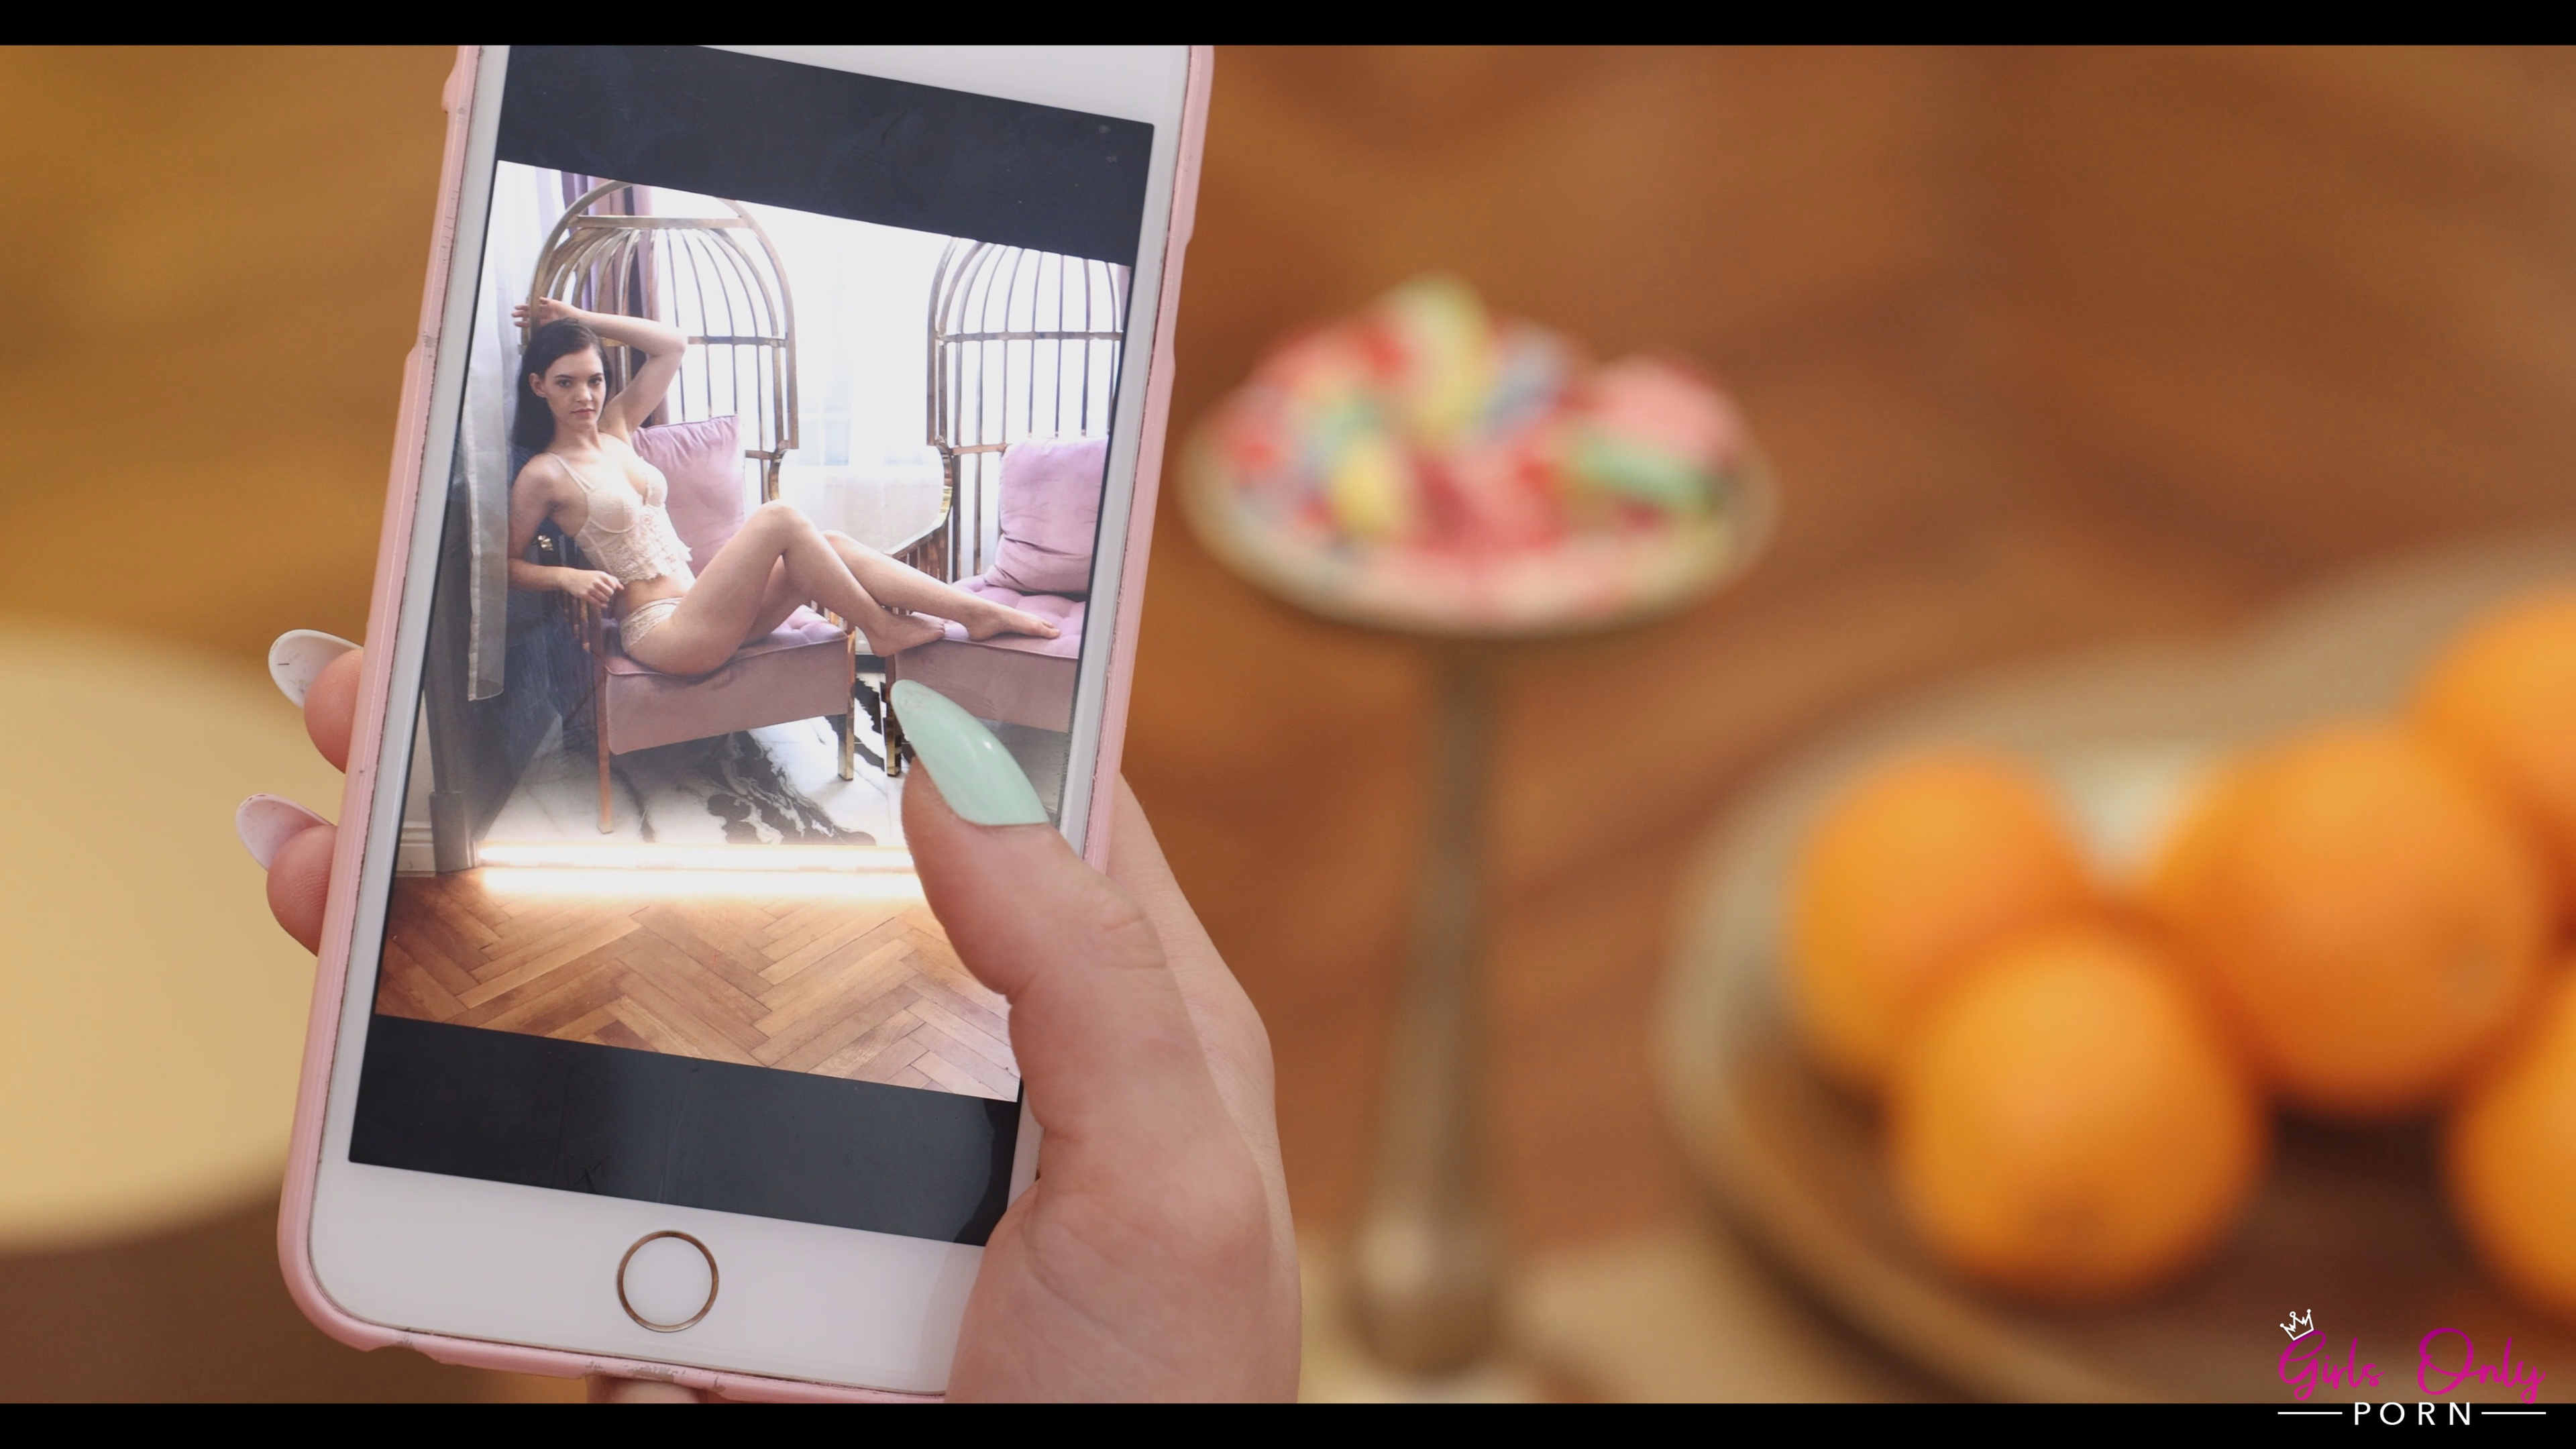 GirlsOnlyPorn.com - Anie Darling,Mia Trejsi: The Sweetest Thing - S2:E2